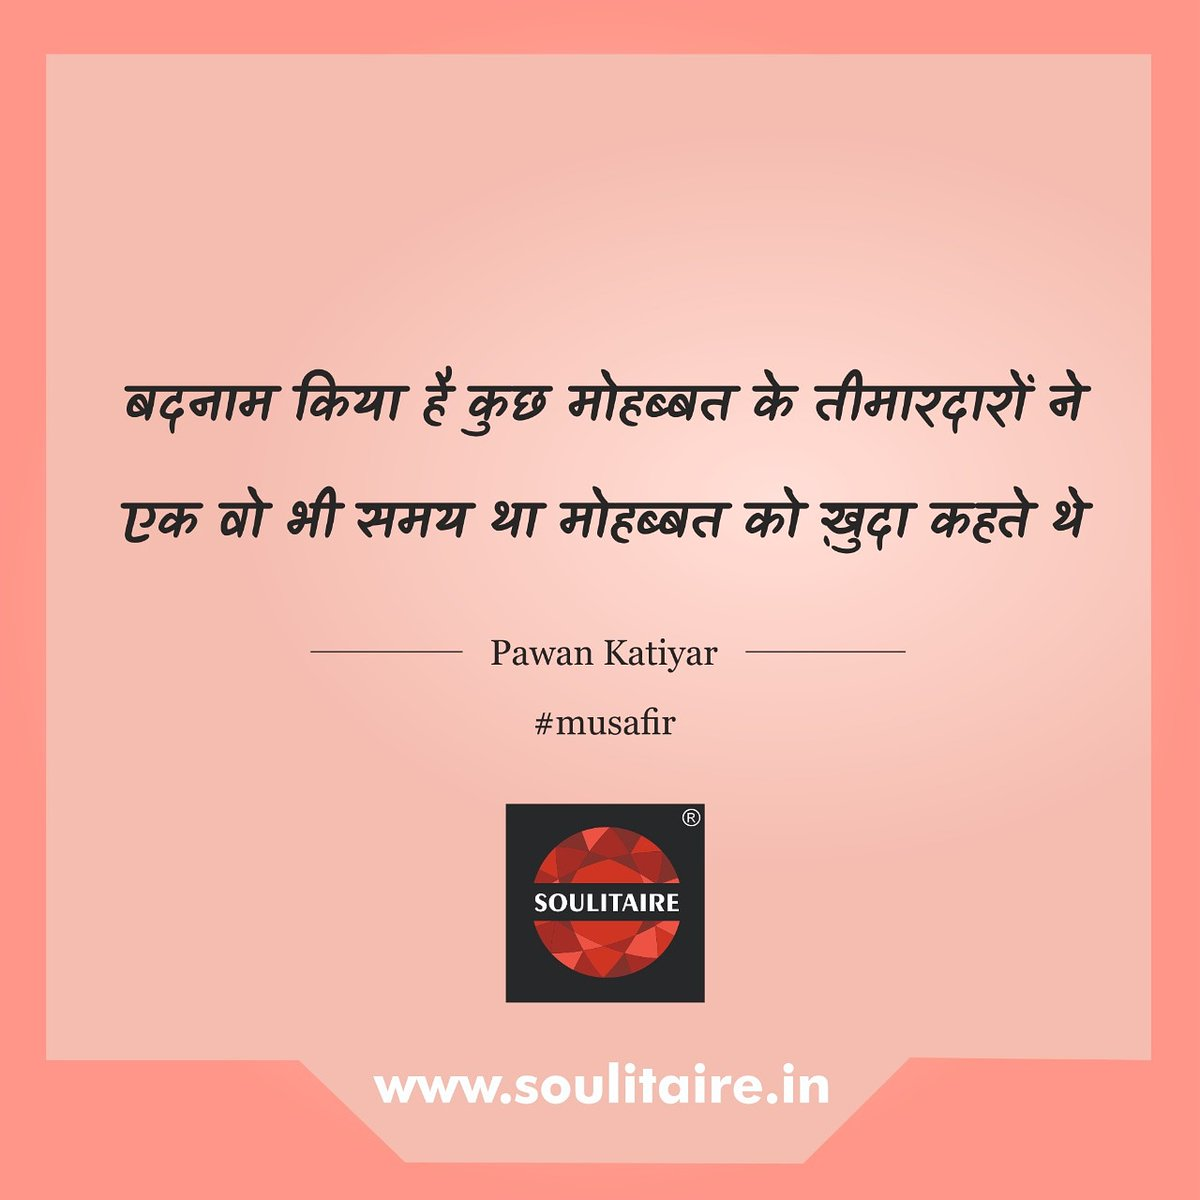 #musafir #soulitaire #twolinershayari #twoliners #hindishayaris #hindipoetry #shayari #shayarana #shayaroninstagram #shayarilover #shayaricollection #shayariforever #shayarikiduniya   @Pawan8695pic.twitter.com/1R0DGHnhFJ